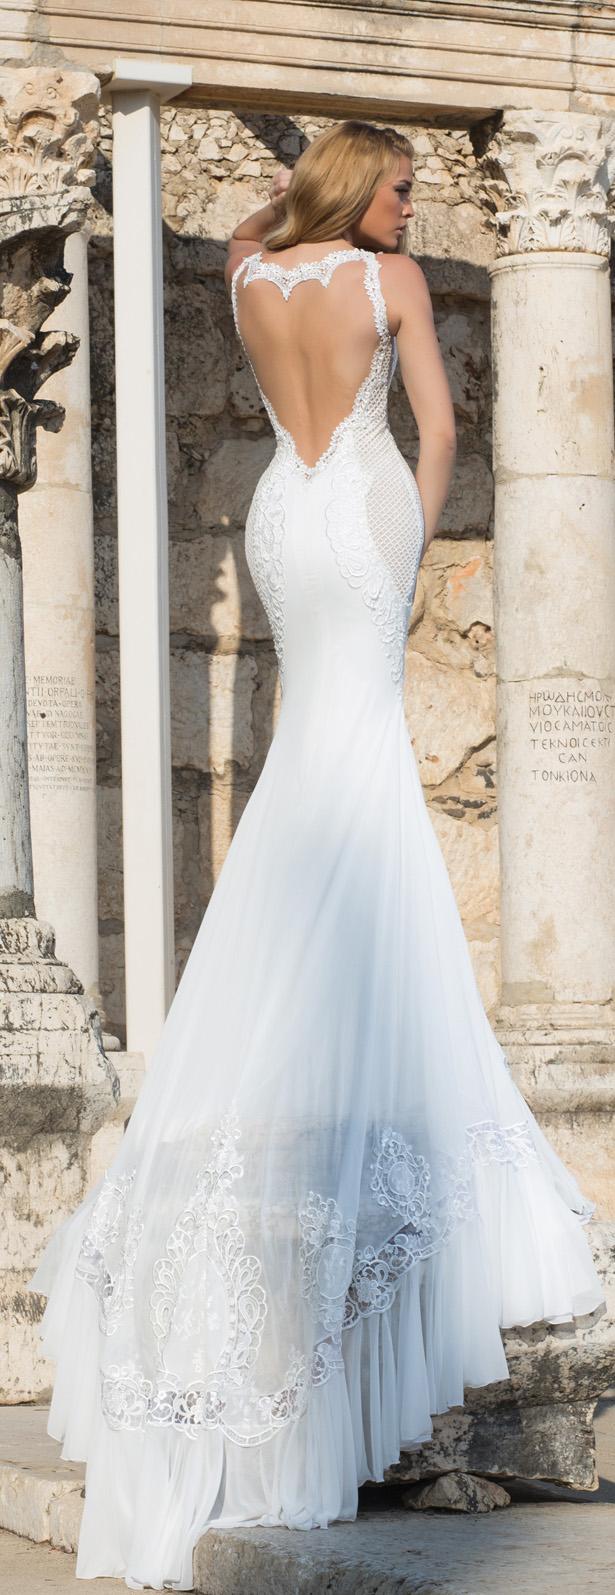 shabiisrael-2015-wedding-dresses-47